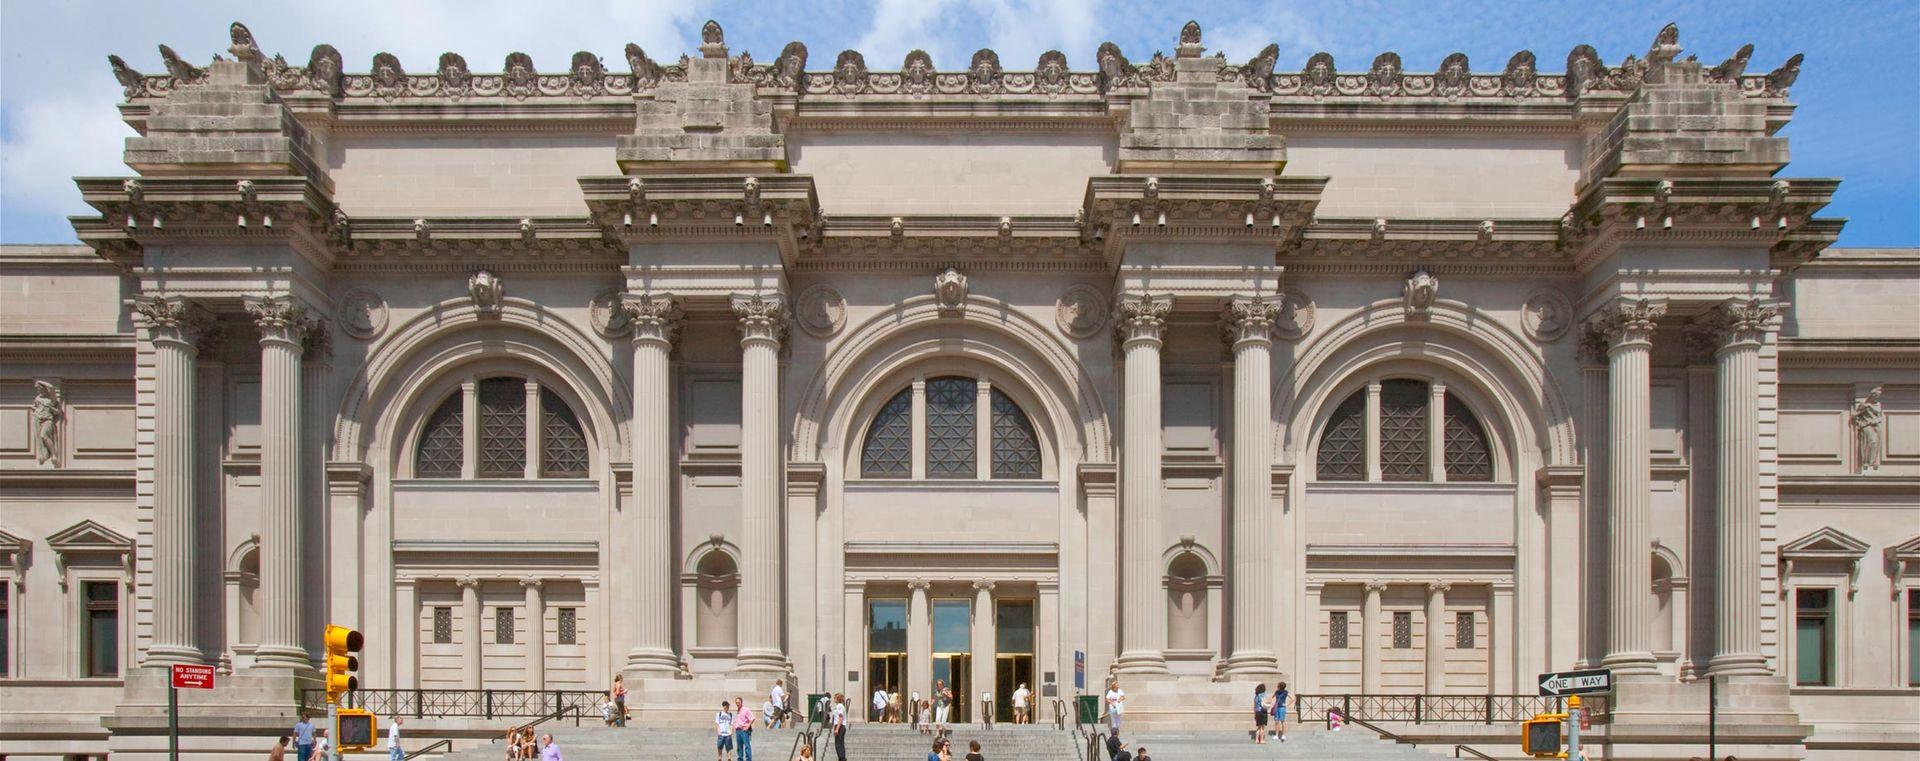 The Metropolitan Museum - New York City